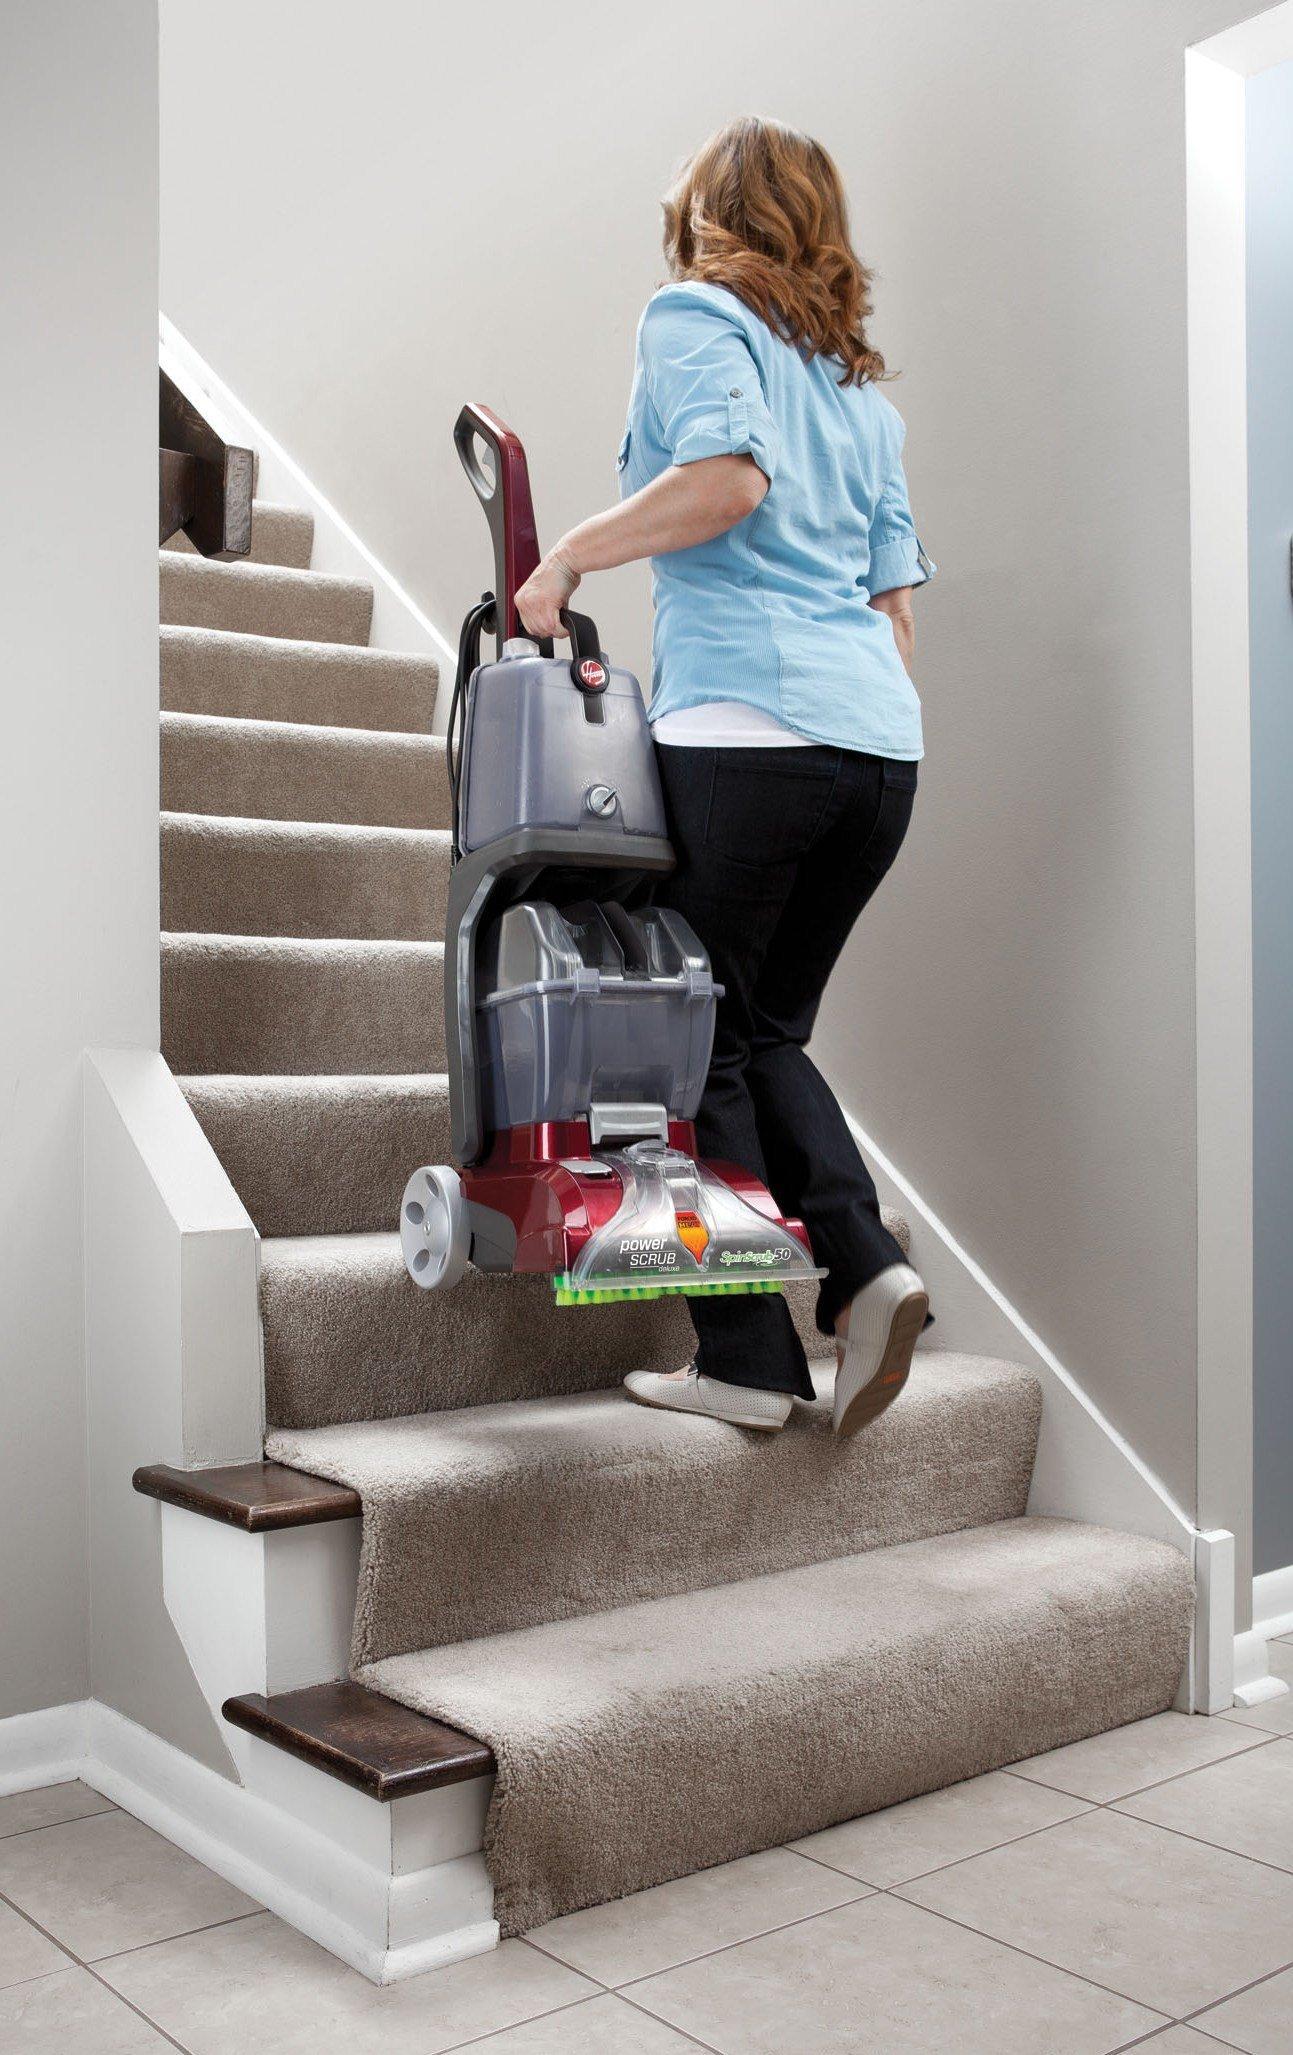 Power Scrub Deluxe Carpet Cleaner4